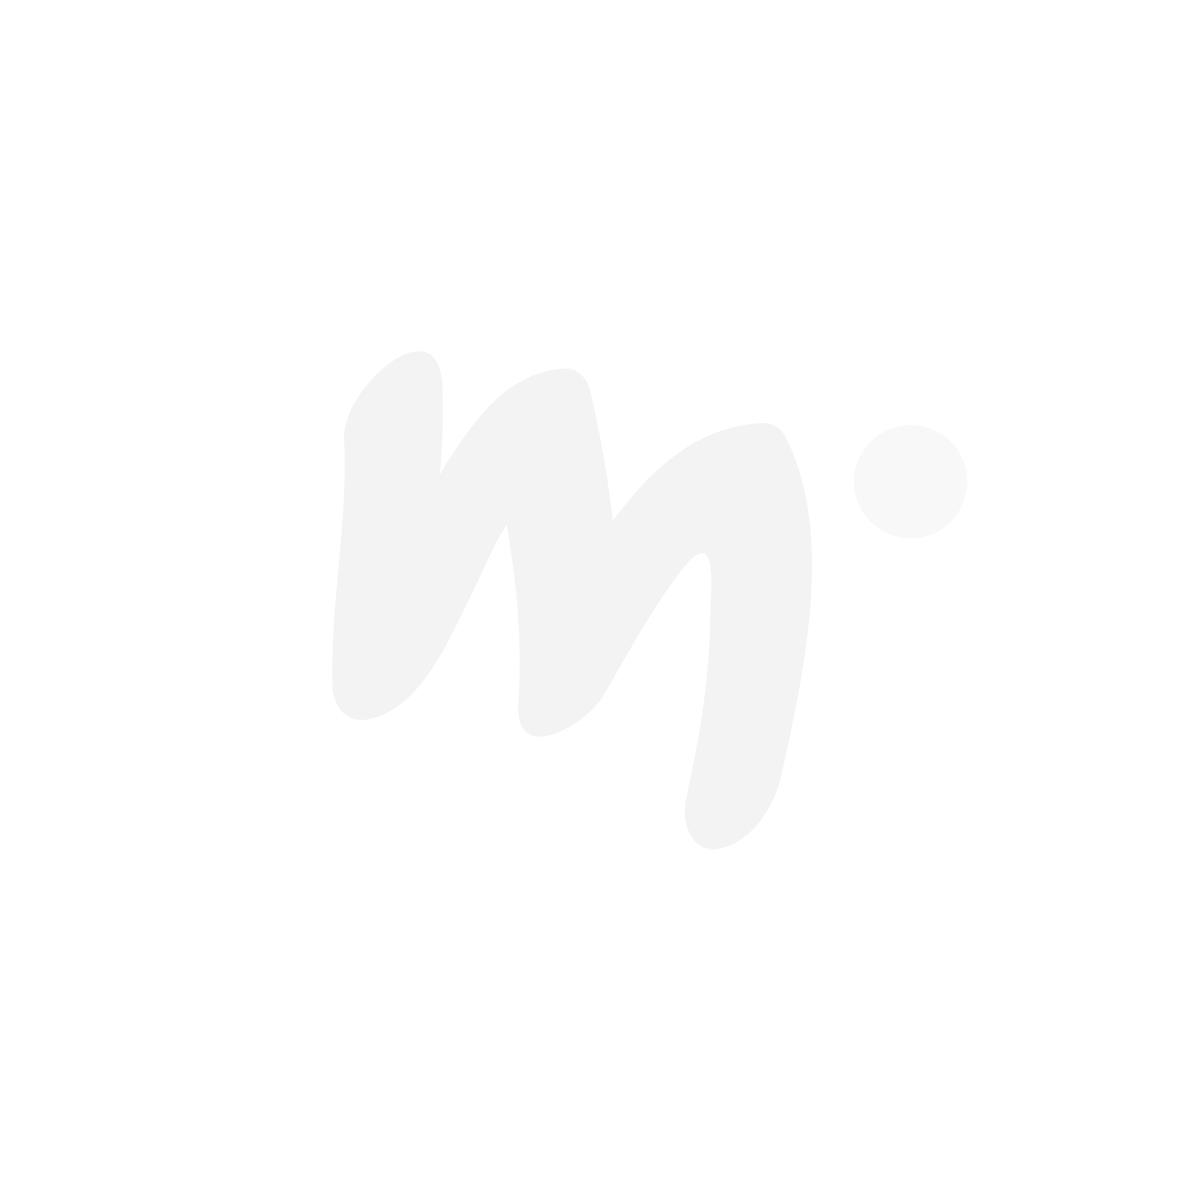 Mx Deco Glittertonttu 40 cm vaaleanpunainen